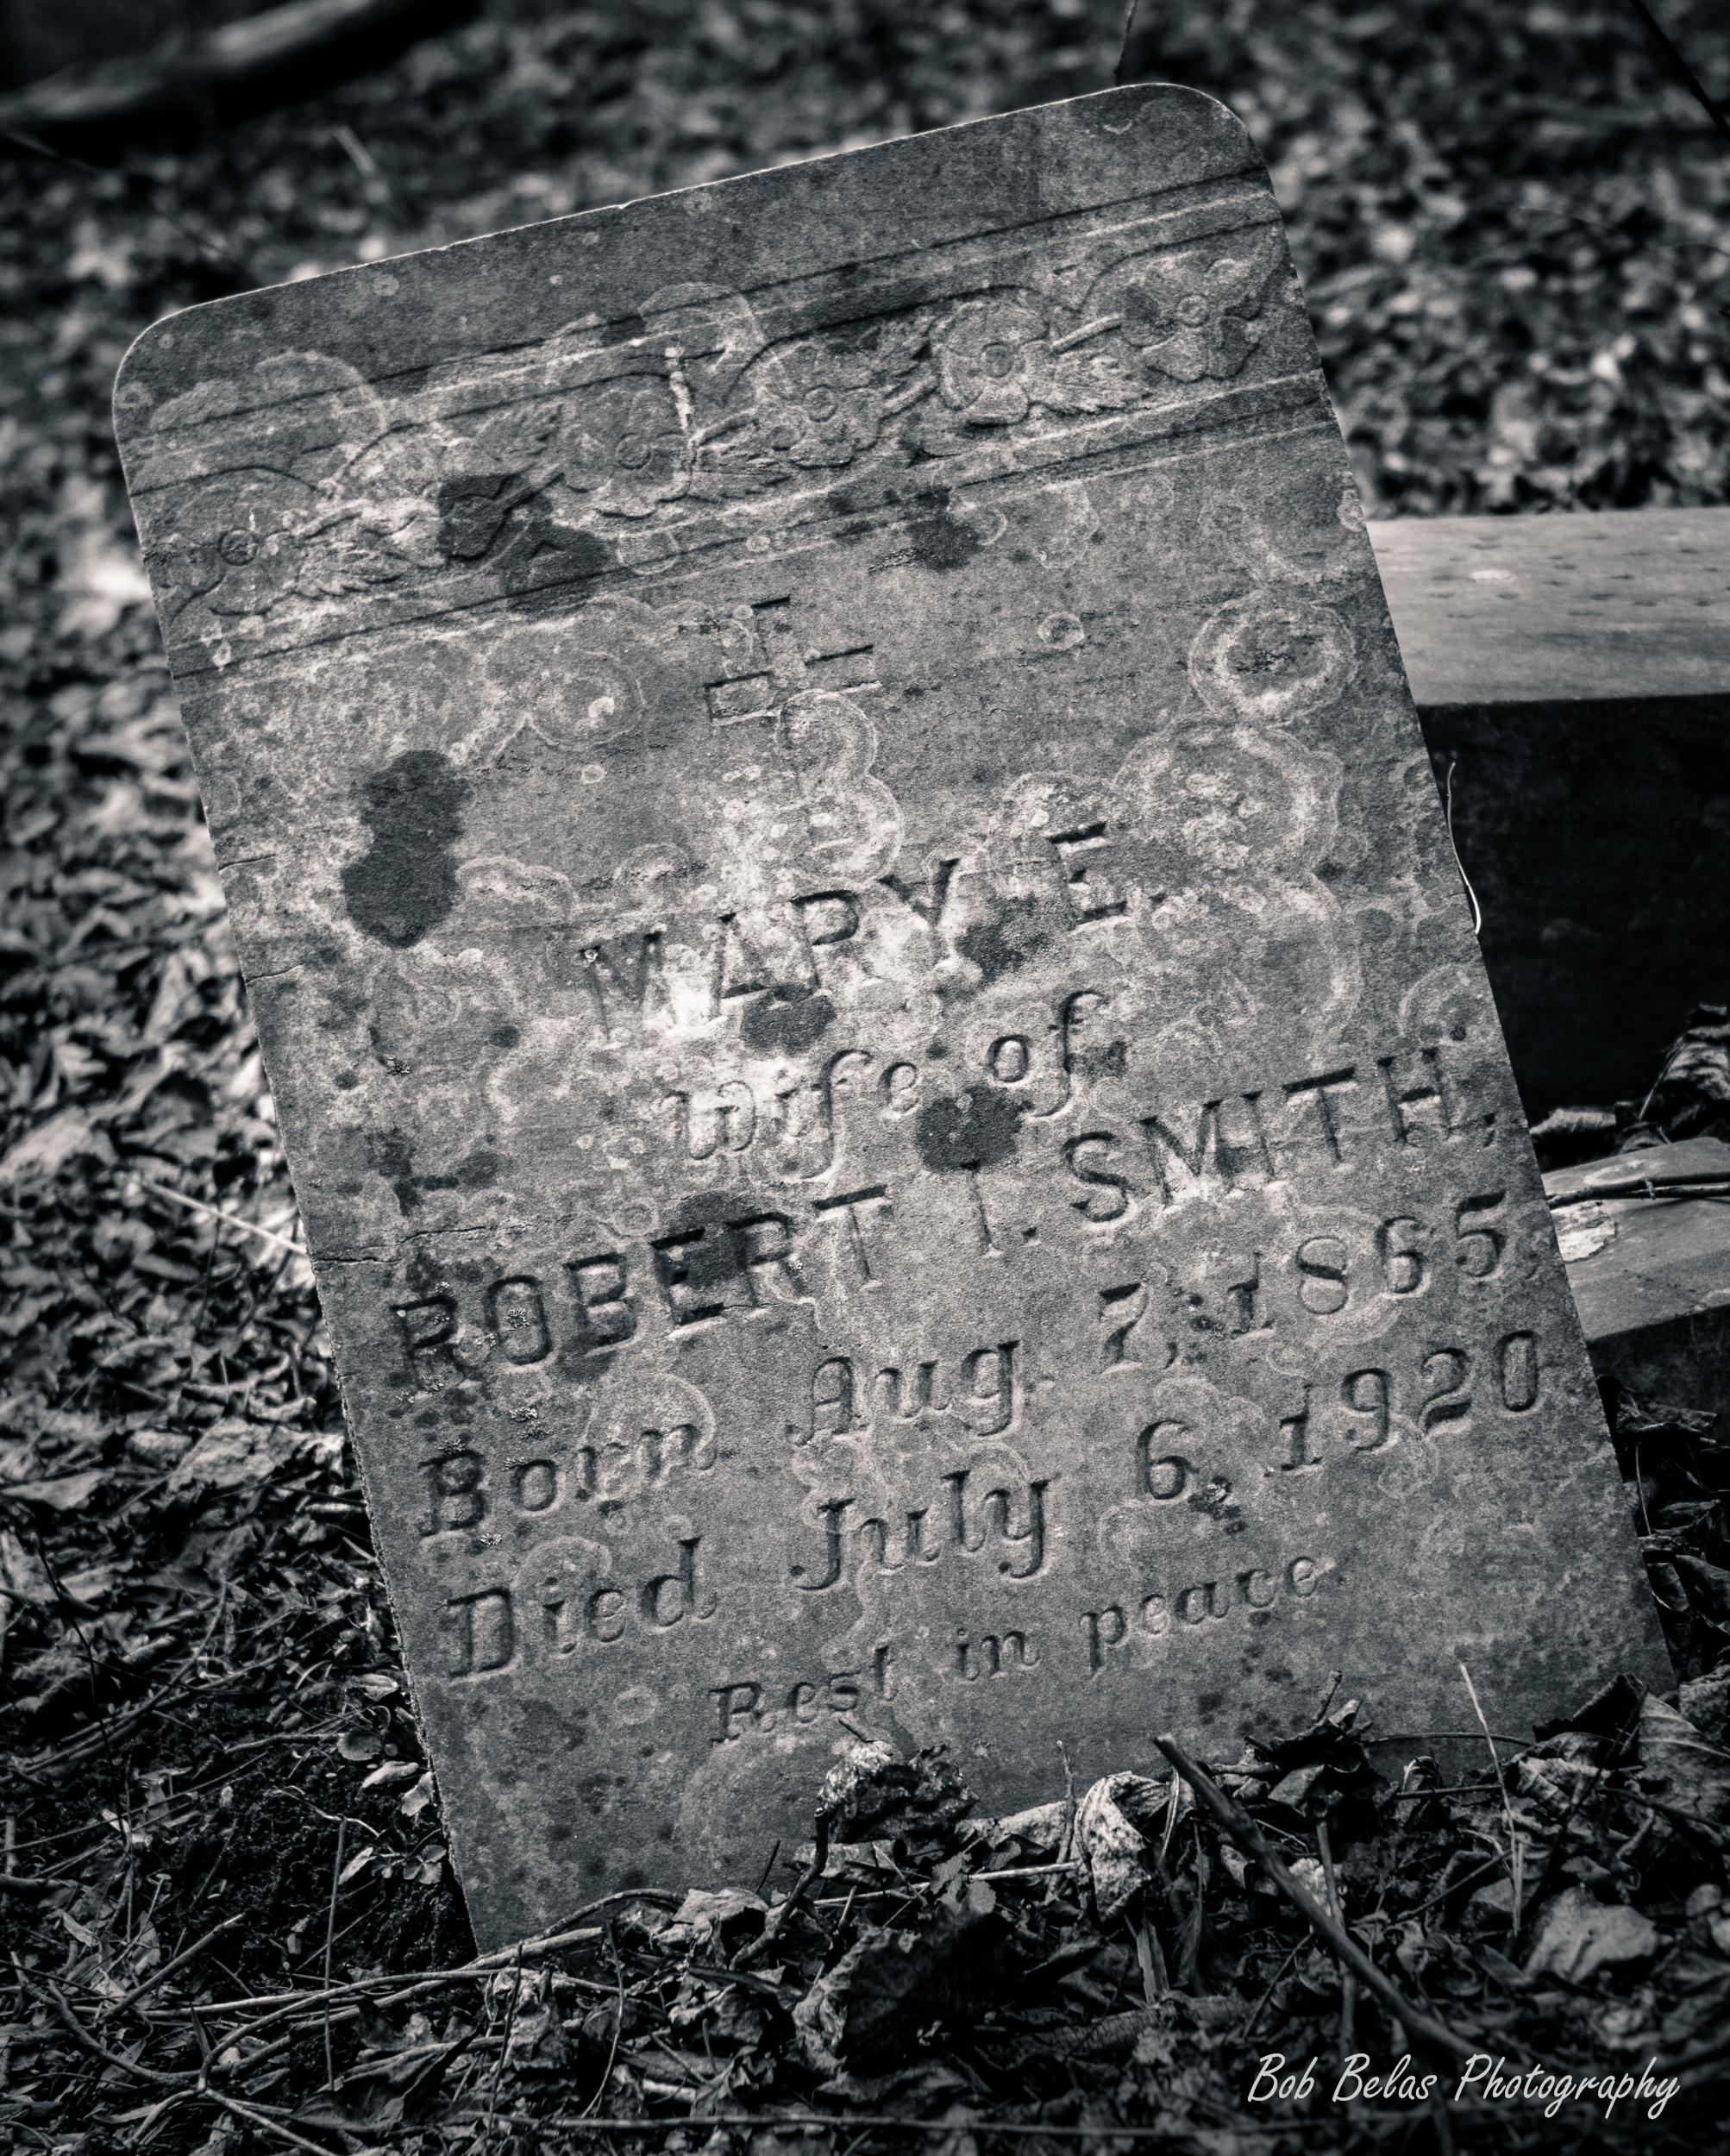 Mary Smith's Grave, monochrome